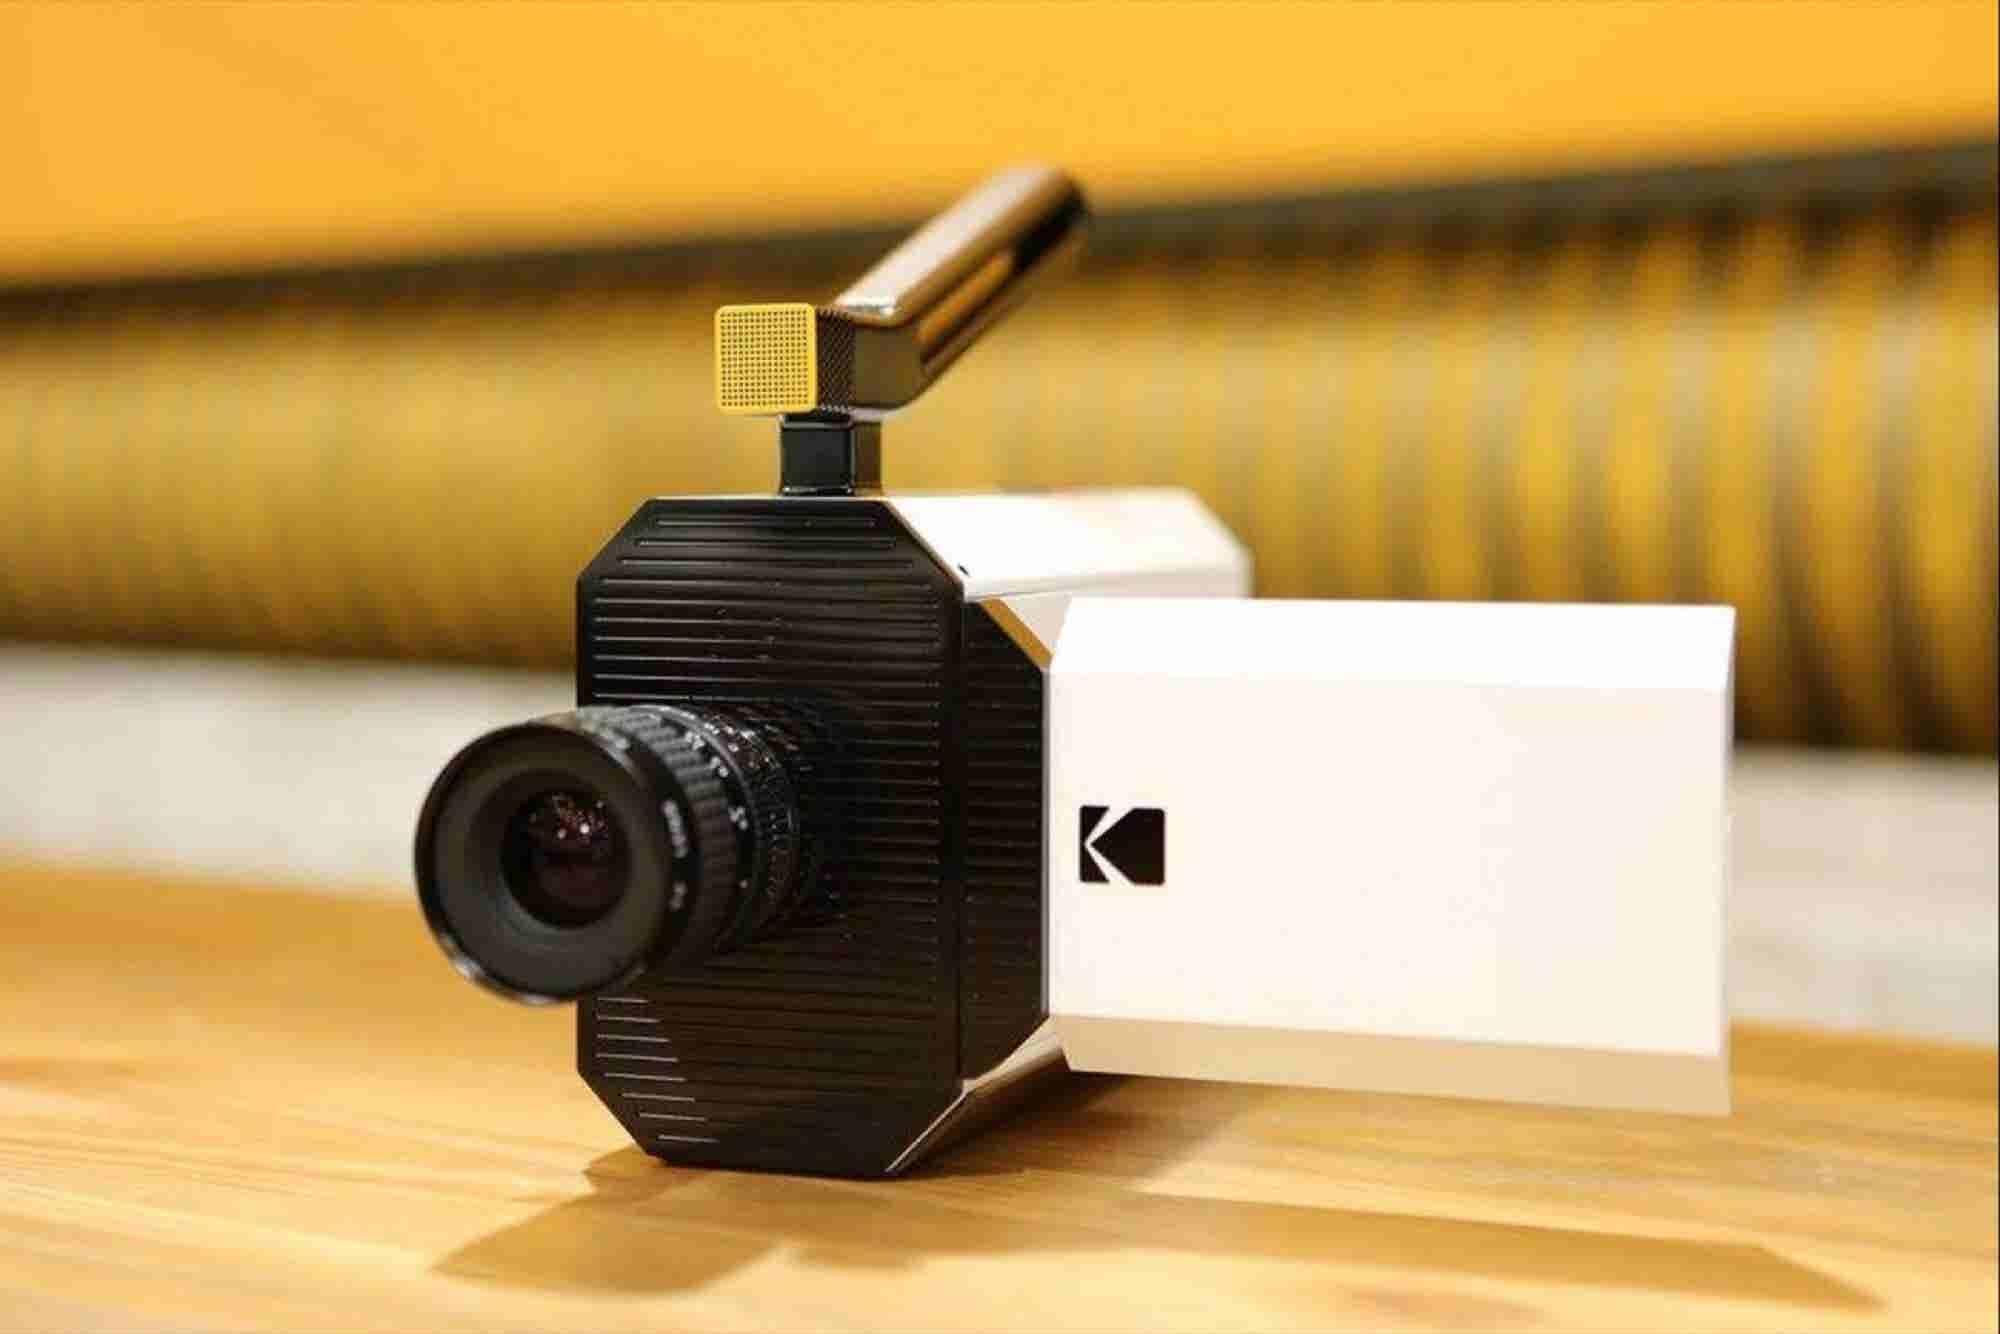 Kodak Is Bringing the Super 8 Video Camera Back